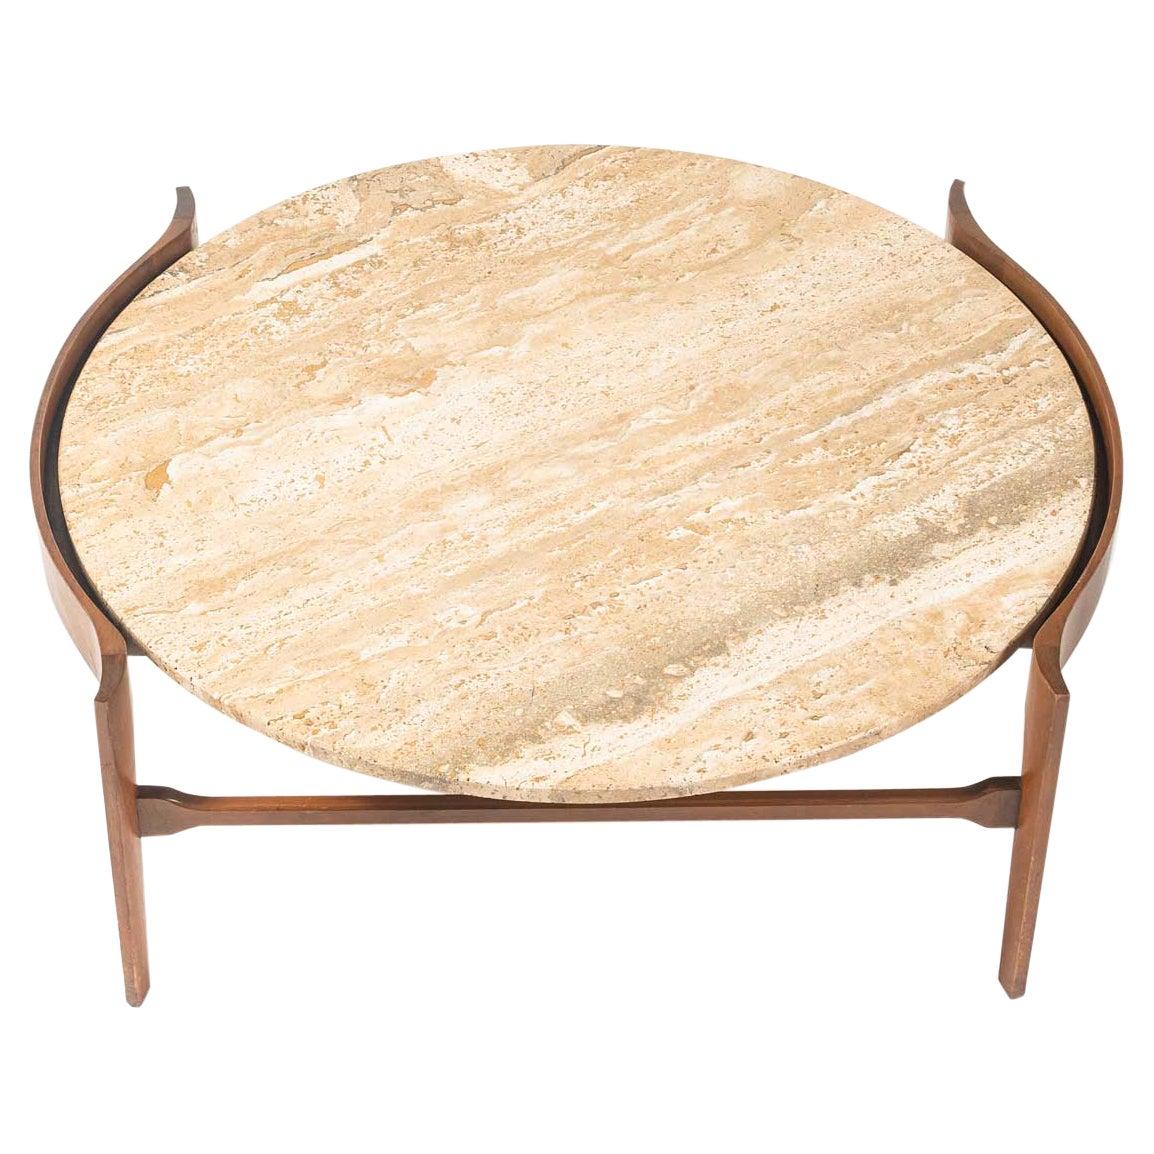 Bertha Schaefer Travertine Round Coffee Table